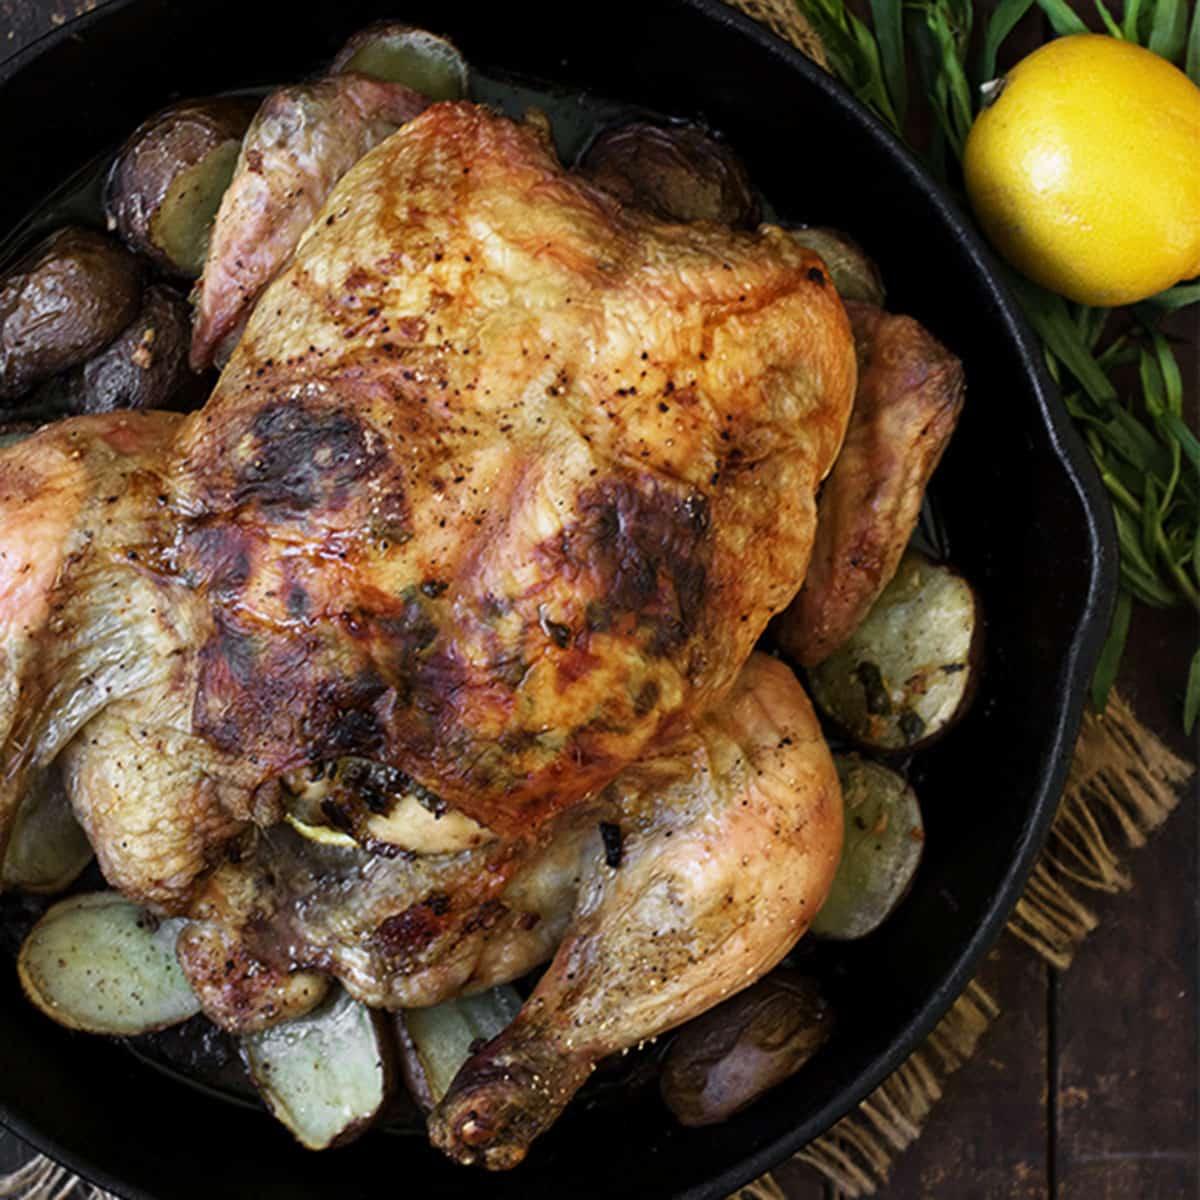 tarragon lemon roasted whole chicken in skillet